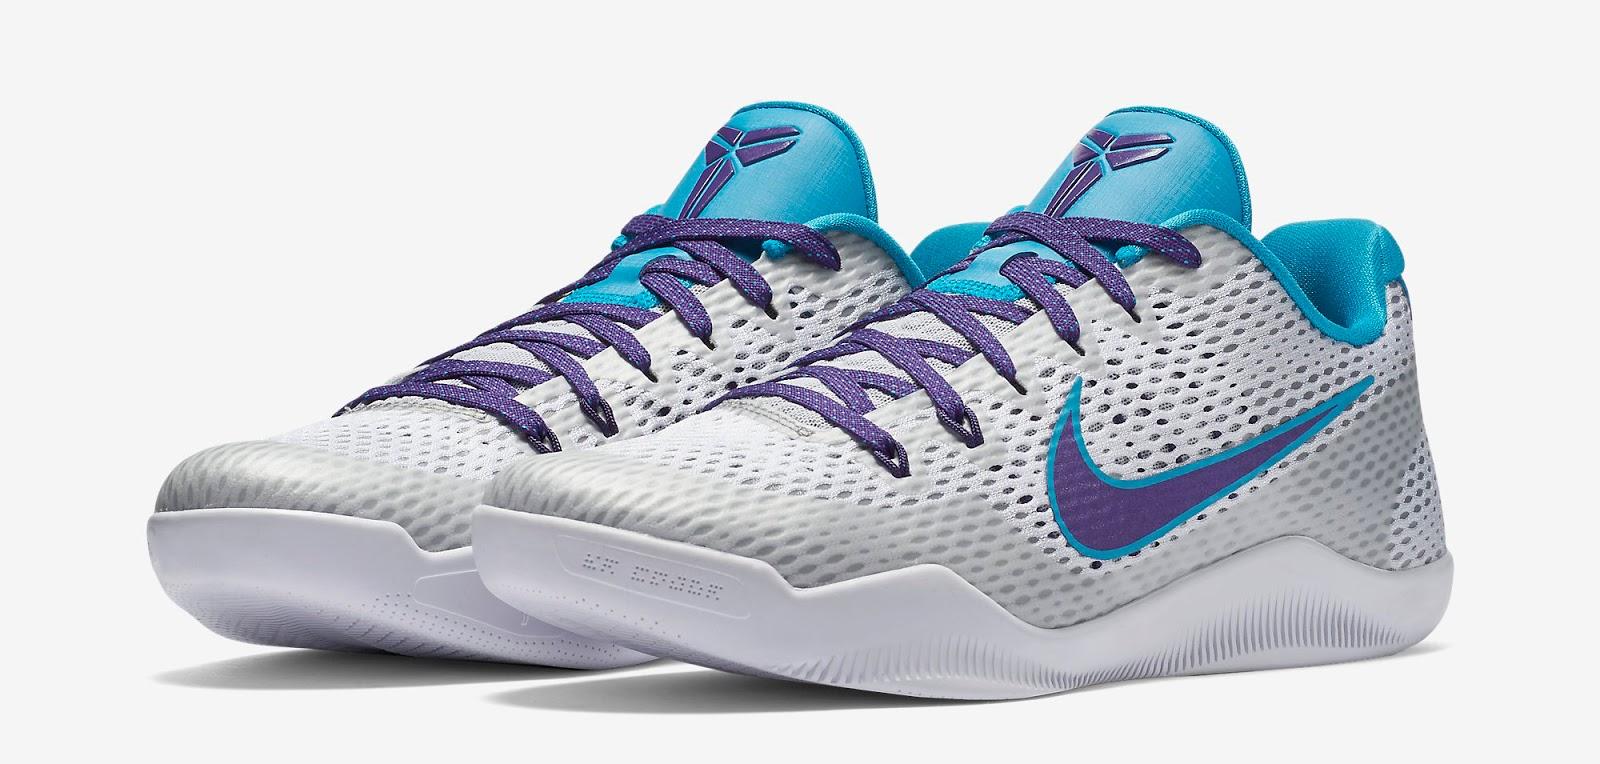 new concept a15b9 1b17b Nike Kobe 11